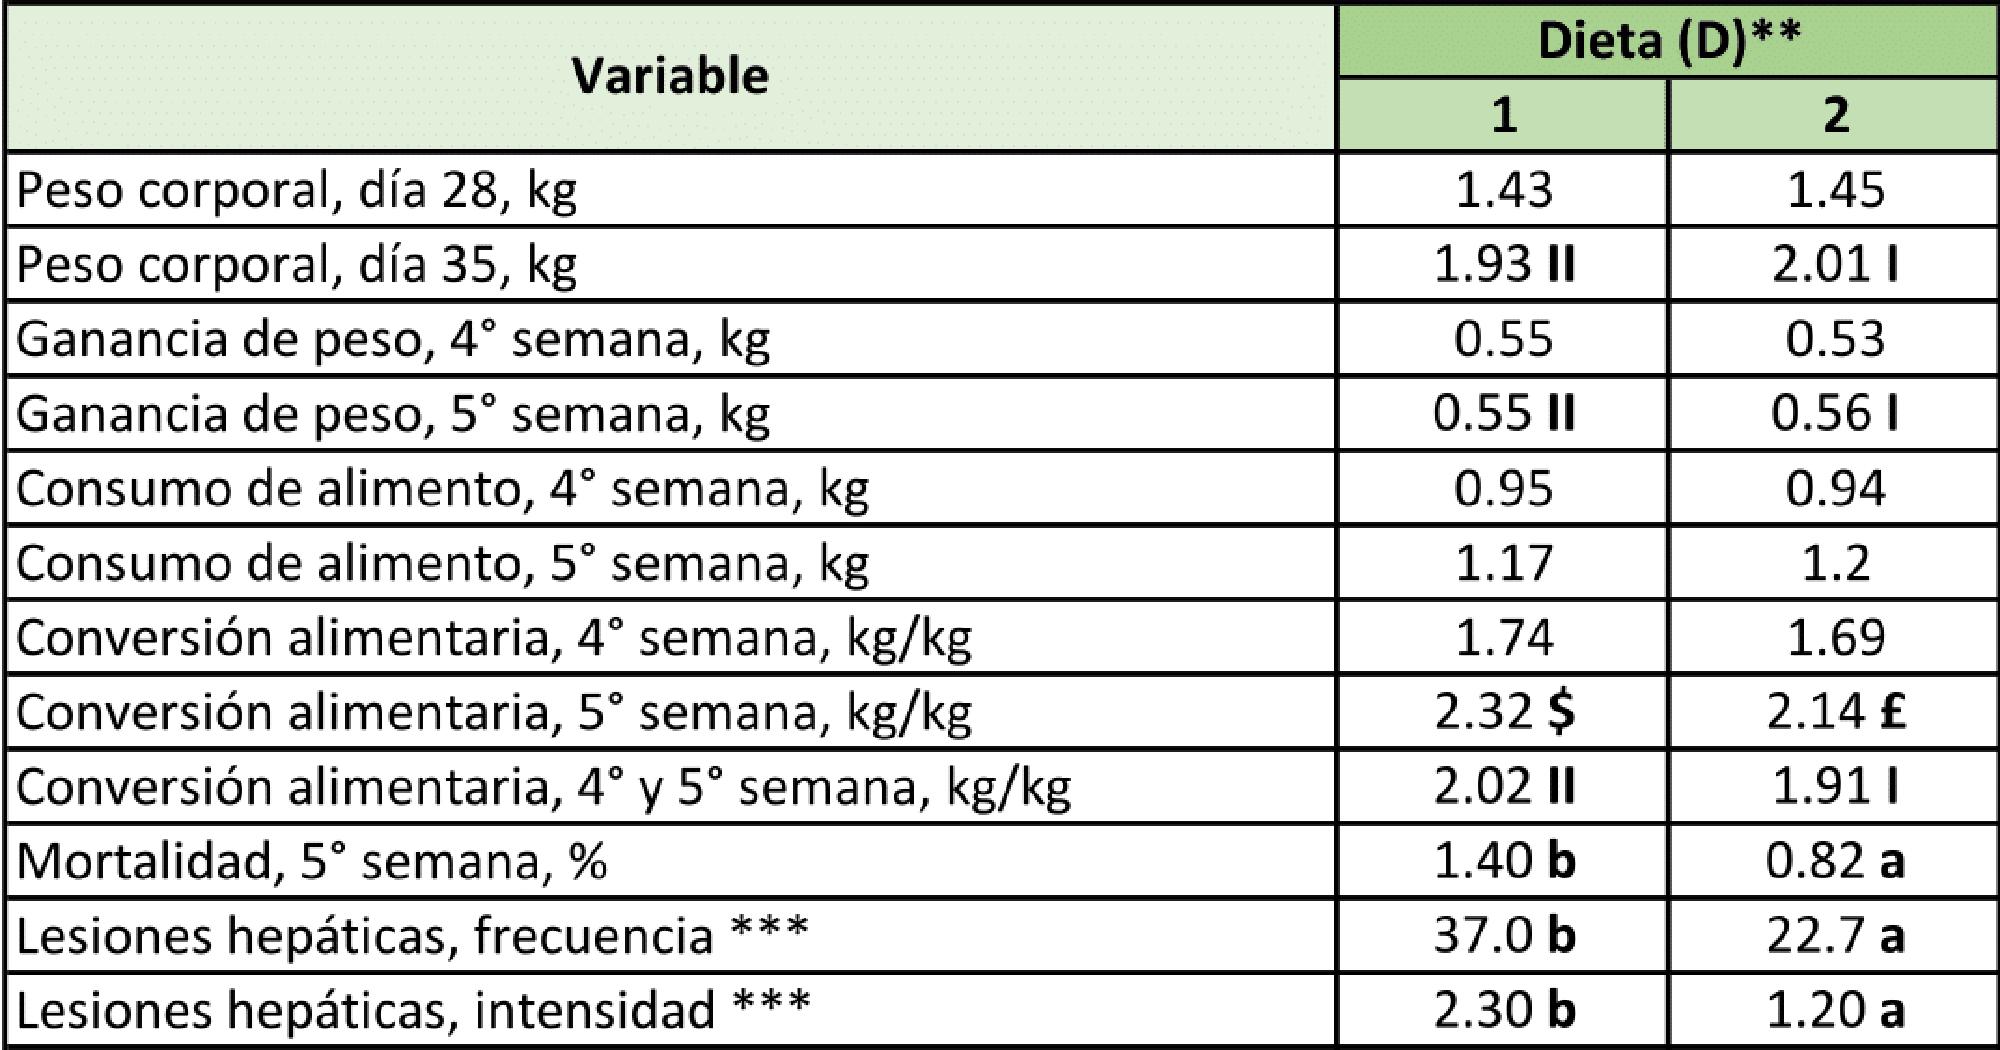 liverin-ckm-1